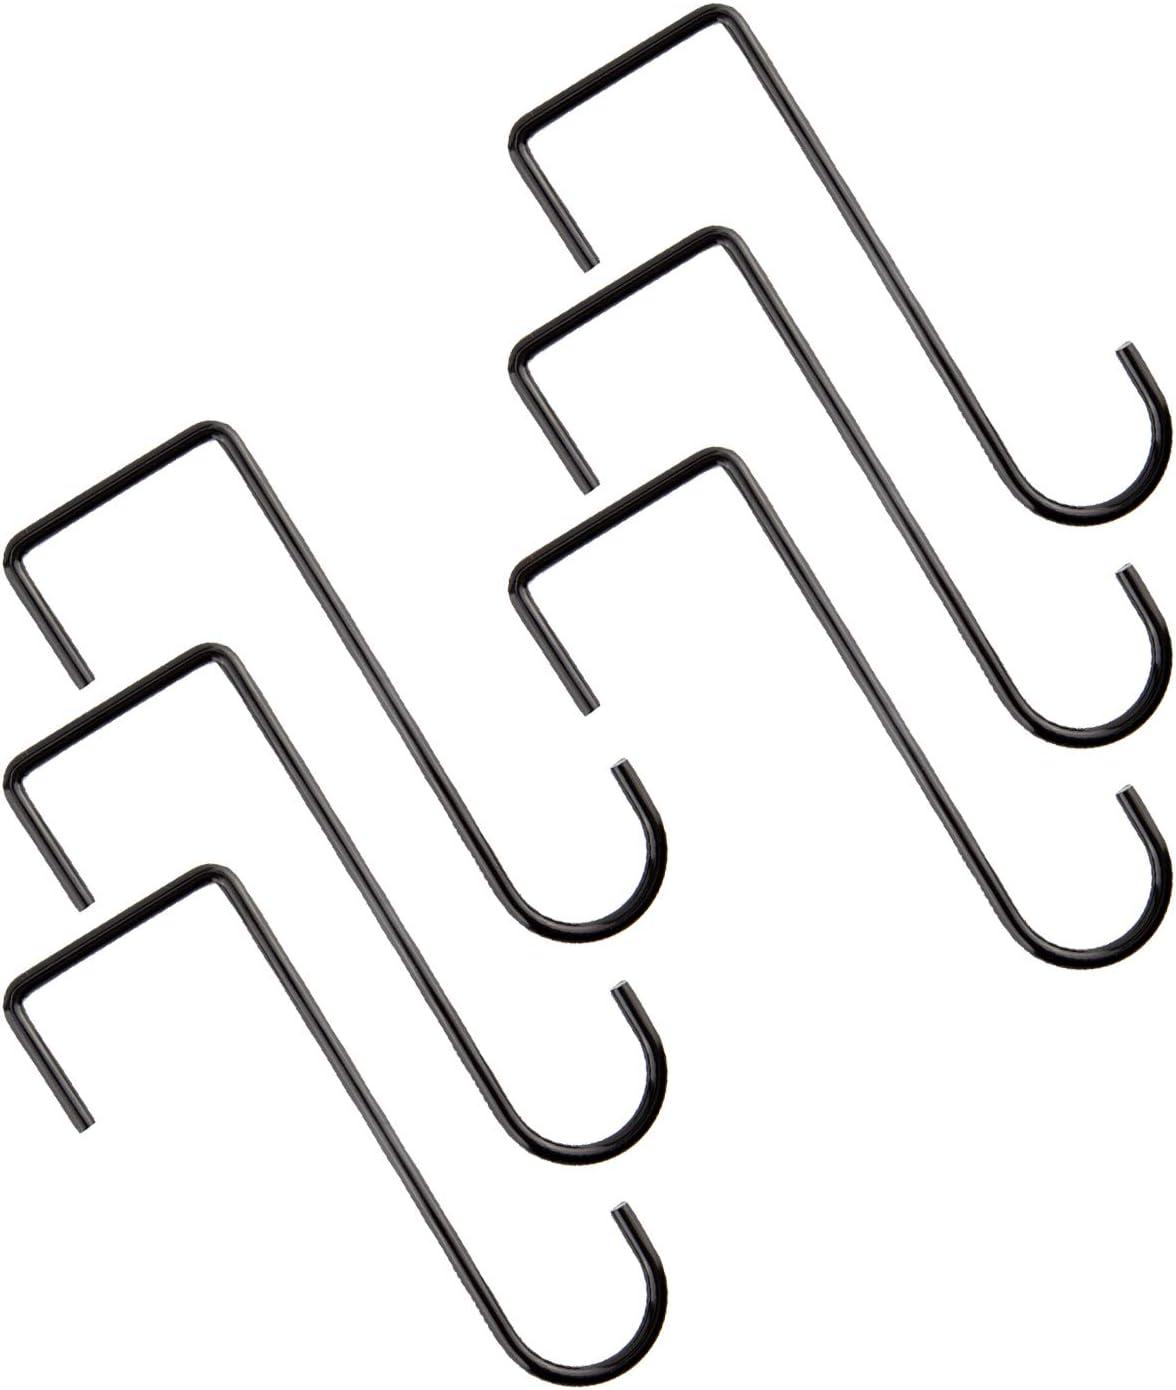 AIEX 6 Pieces Vinyl Fence Hooks Plant Hanger Stainless Steel Wall Hanging Brackets for Indoor & Outdoor Hanging Lights, Plants & Planters, Bird Feeder, Gardening Decoration 2x6inch (Black)